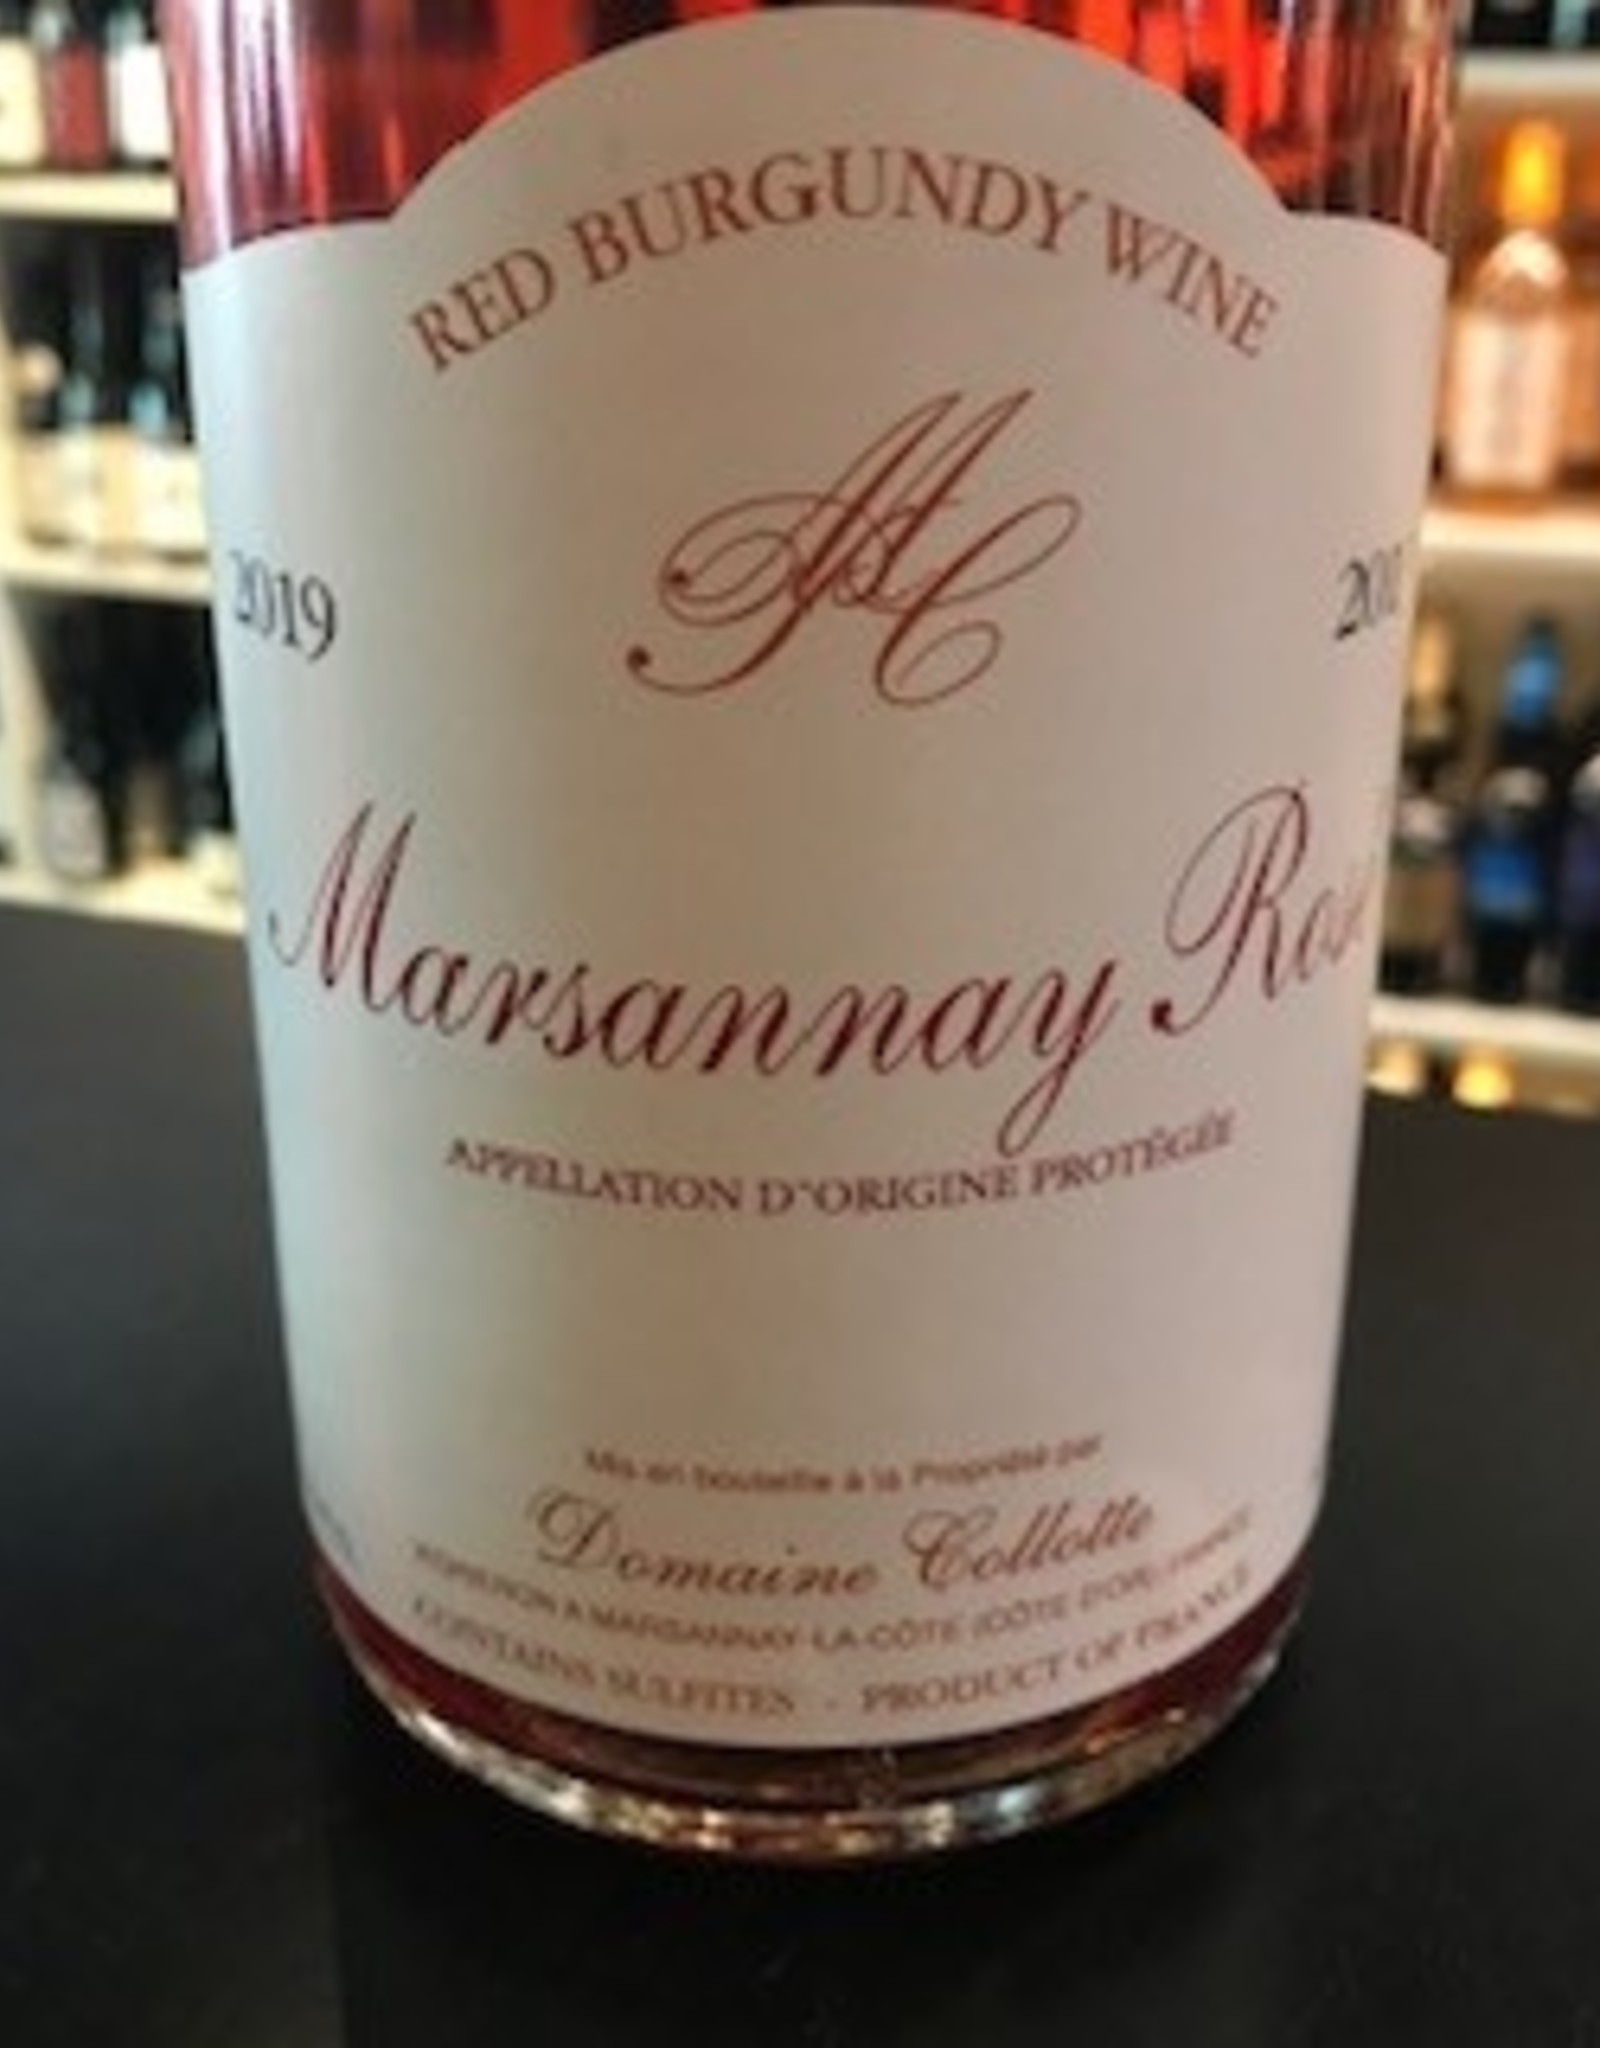 Still Rose, Marsannay, Domaine Collotte 2019